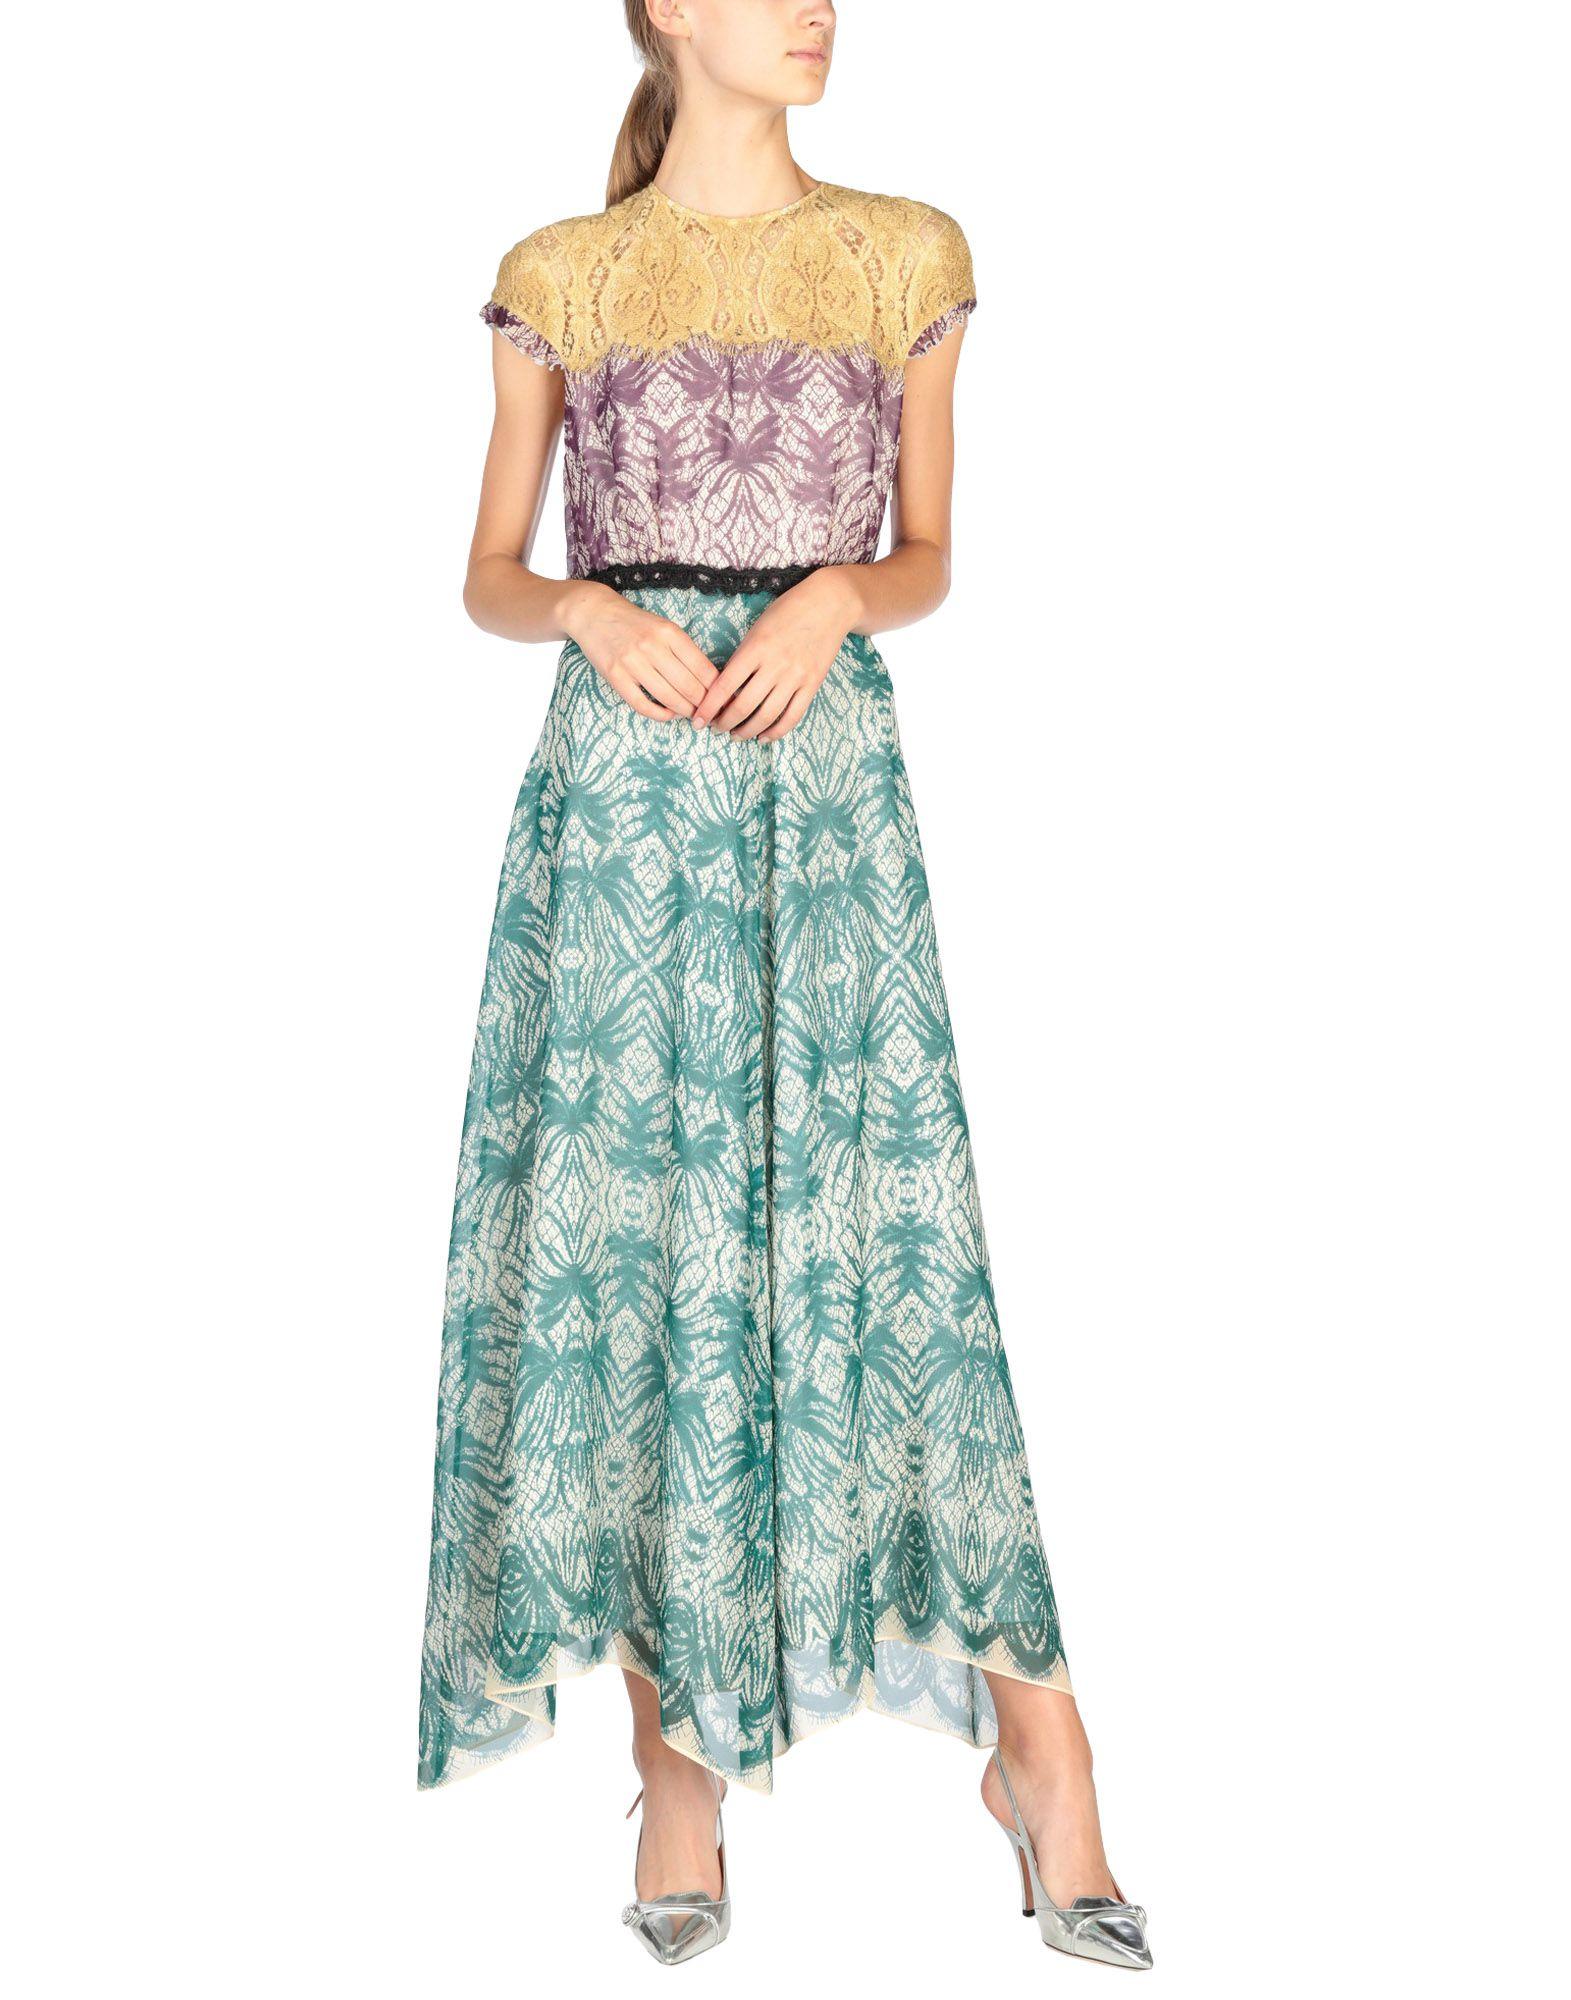 Formal Dress in Camel